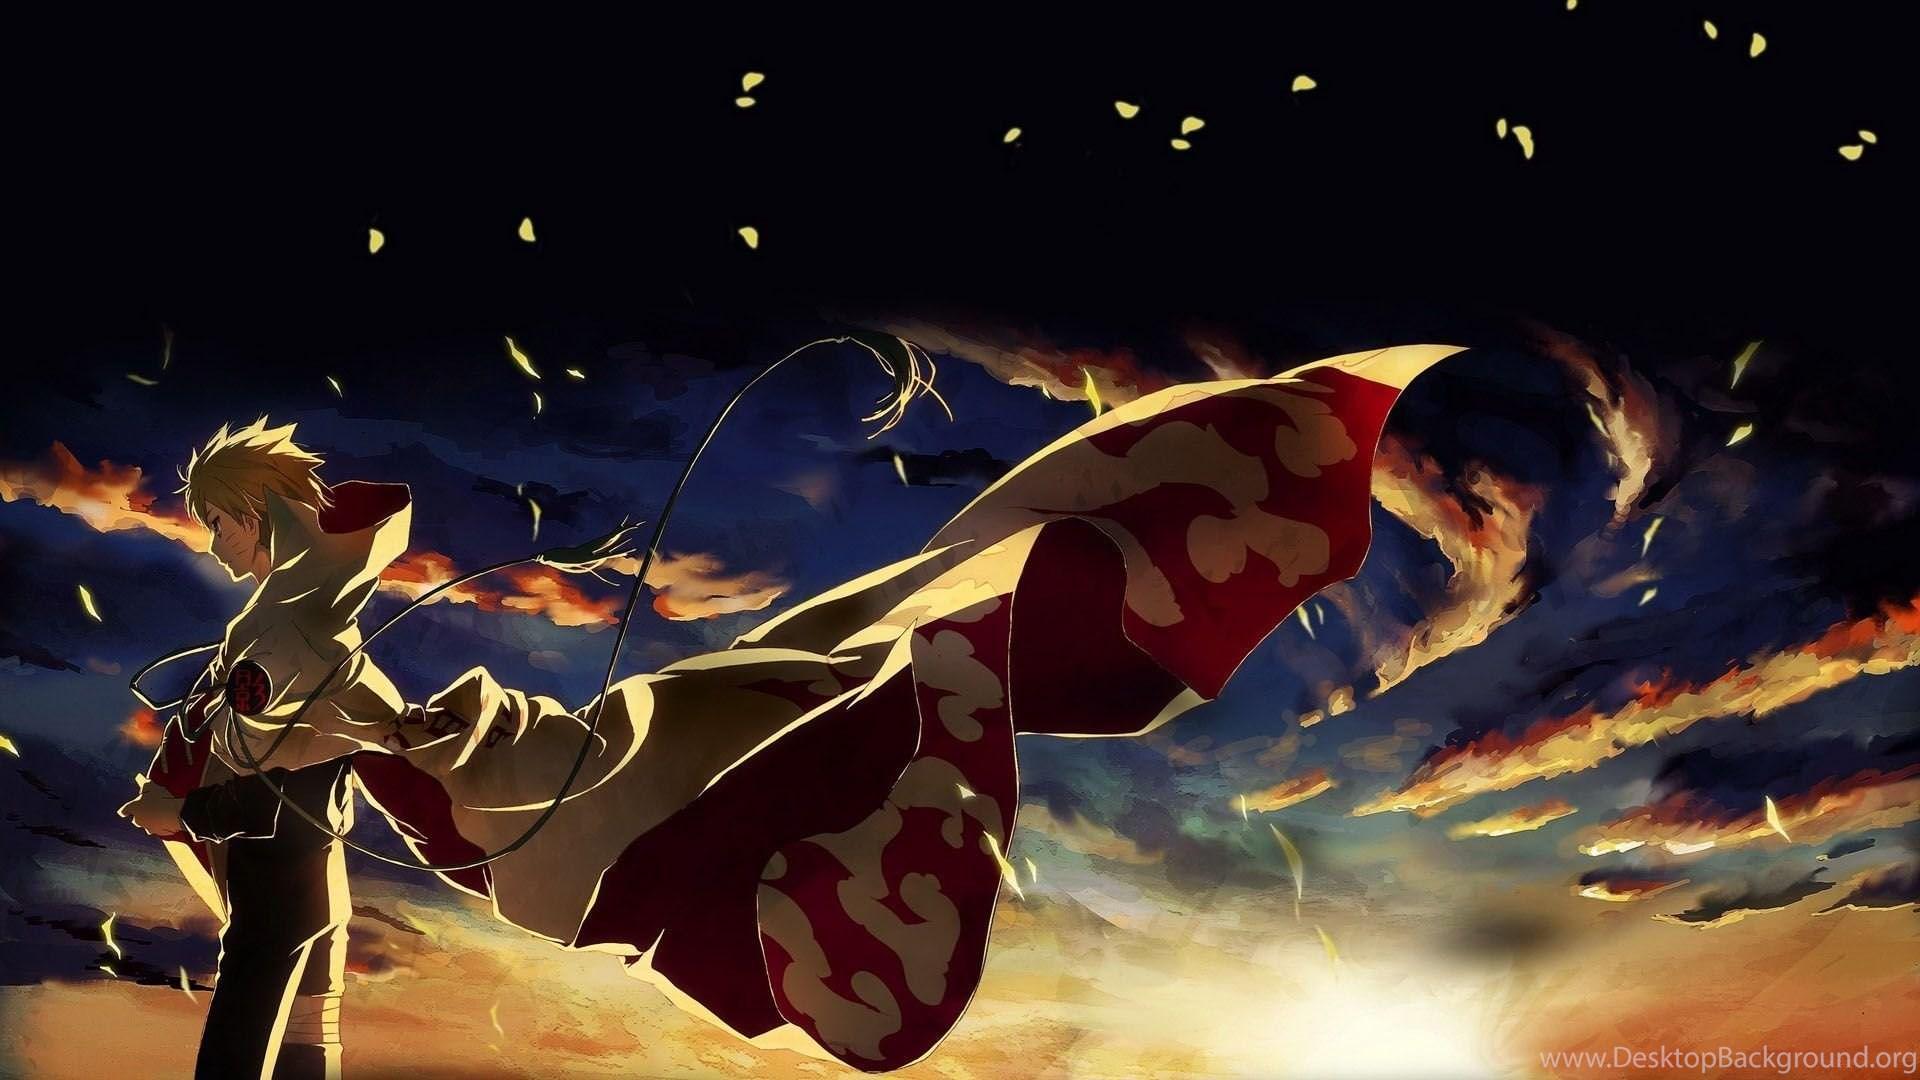 Good Wallpaper Naruto 1080p - 90223_naruto-shippuden-wallpapers-hd-1080p-1748012_1920x1080_h  Pic_56729.jpg